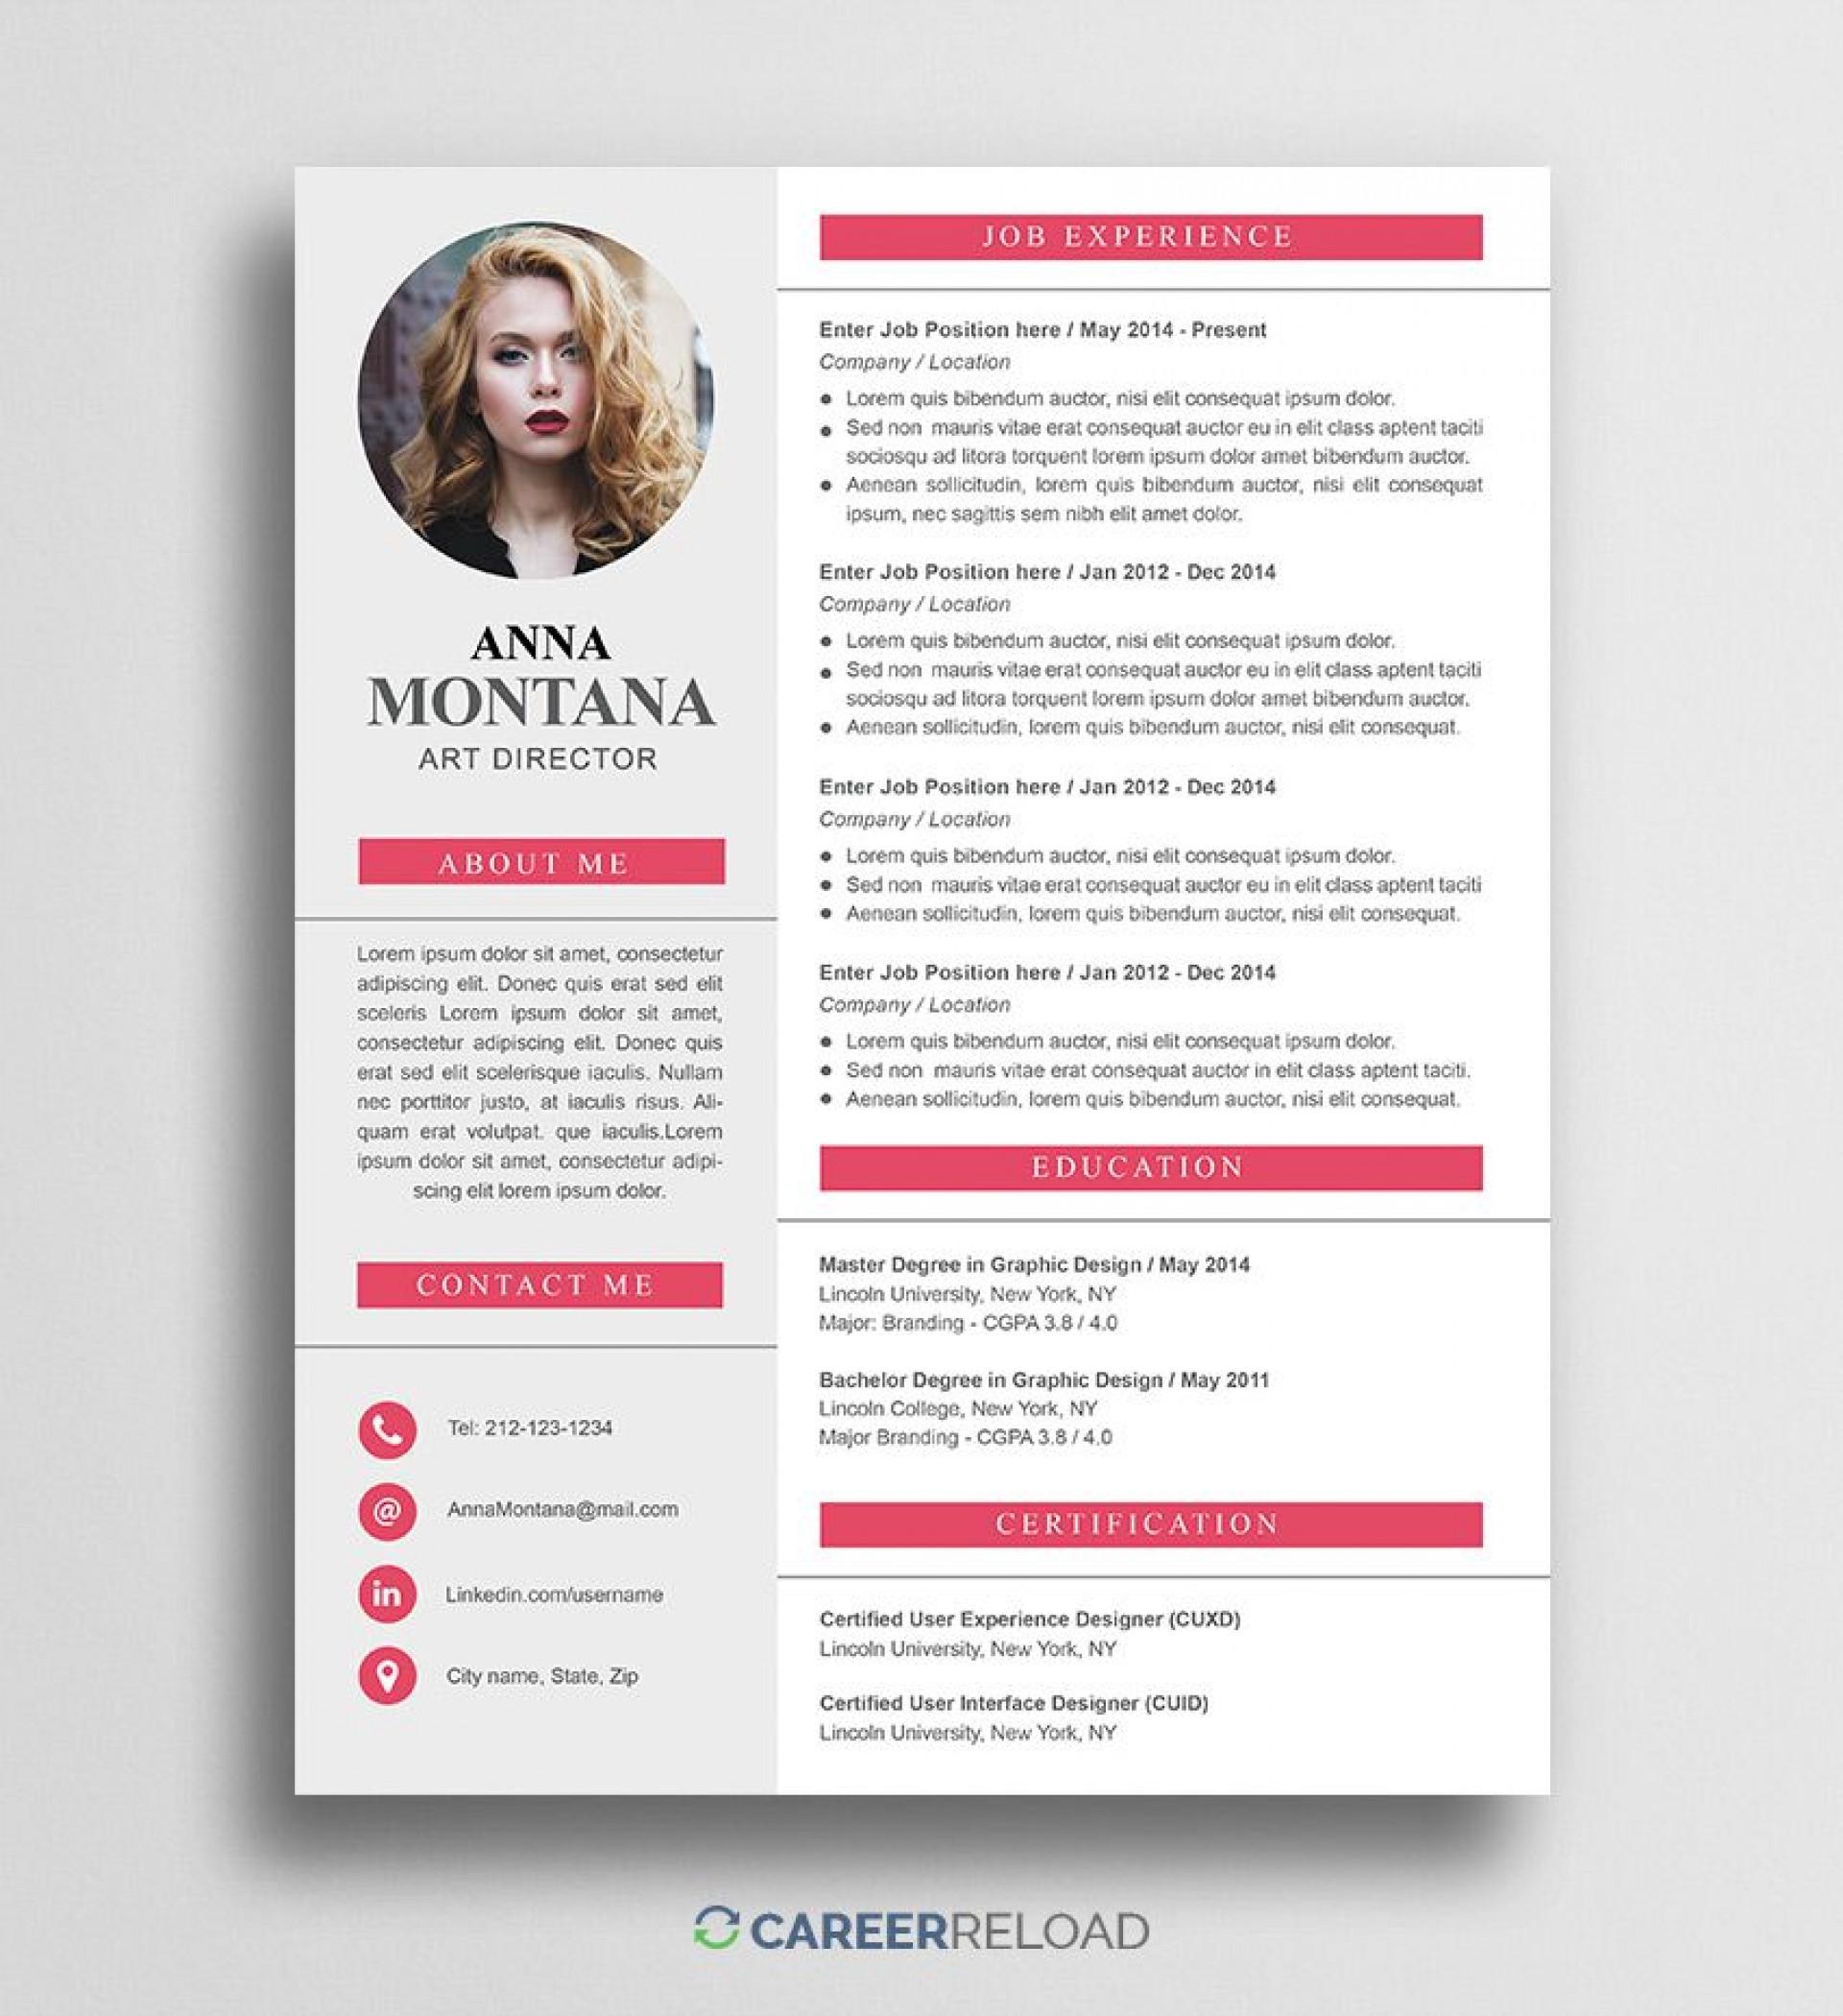 008 Sensational Cv Design Photoshop Template Free Photo  Resume Psd Download1920